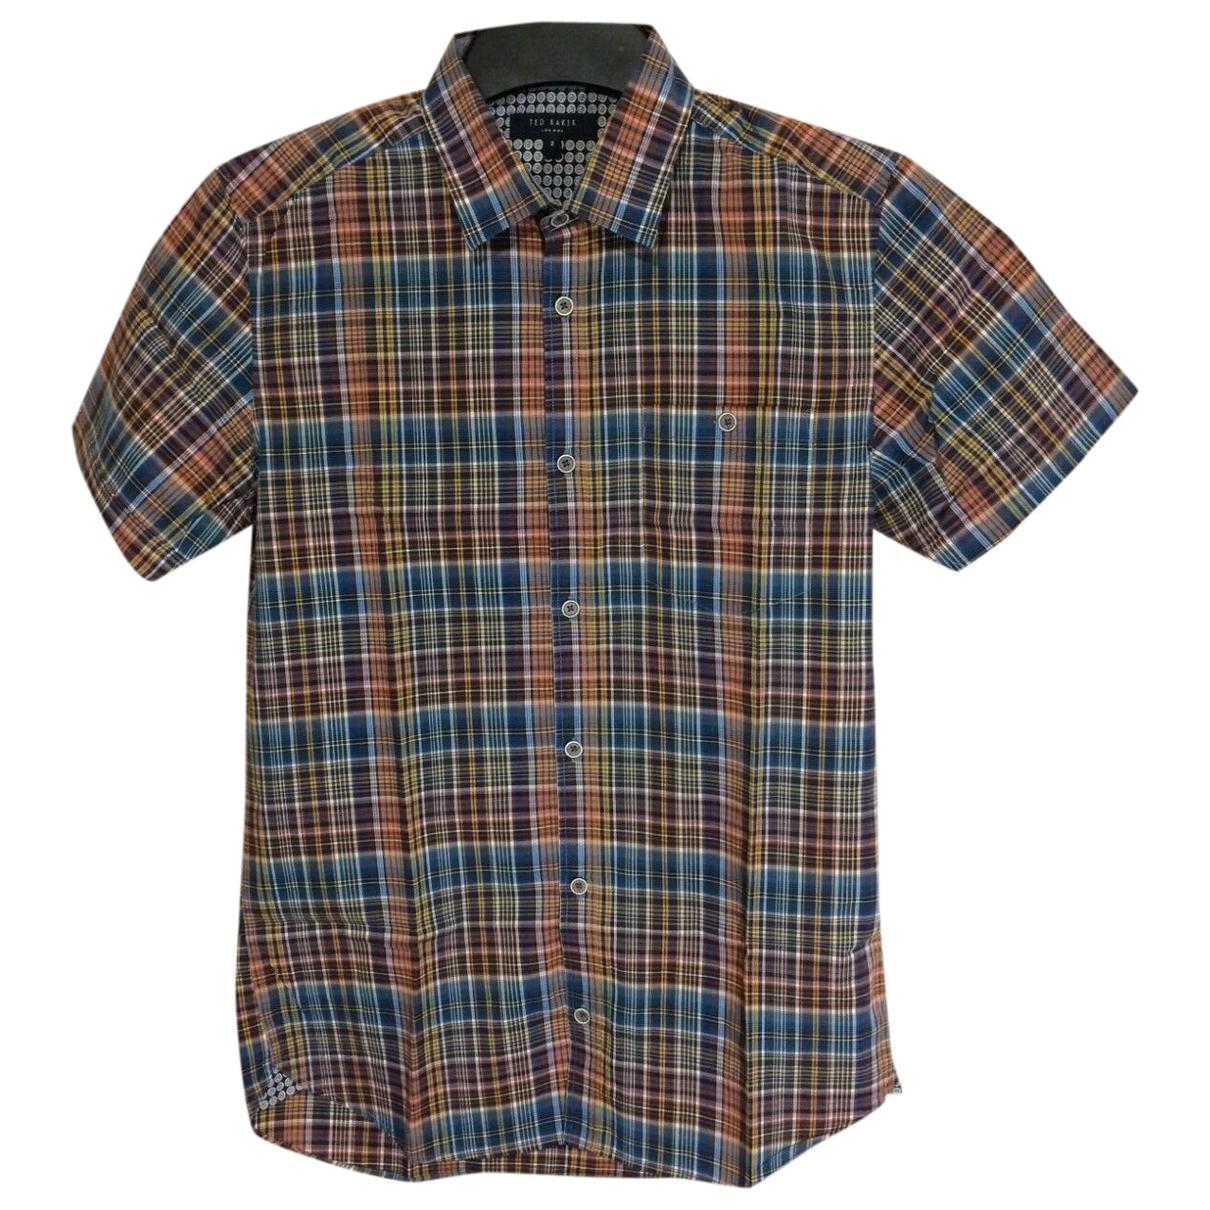 Ted Baker \N Multicolour Cotton Shirts for Men S International